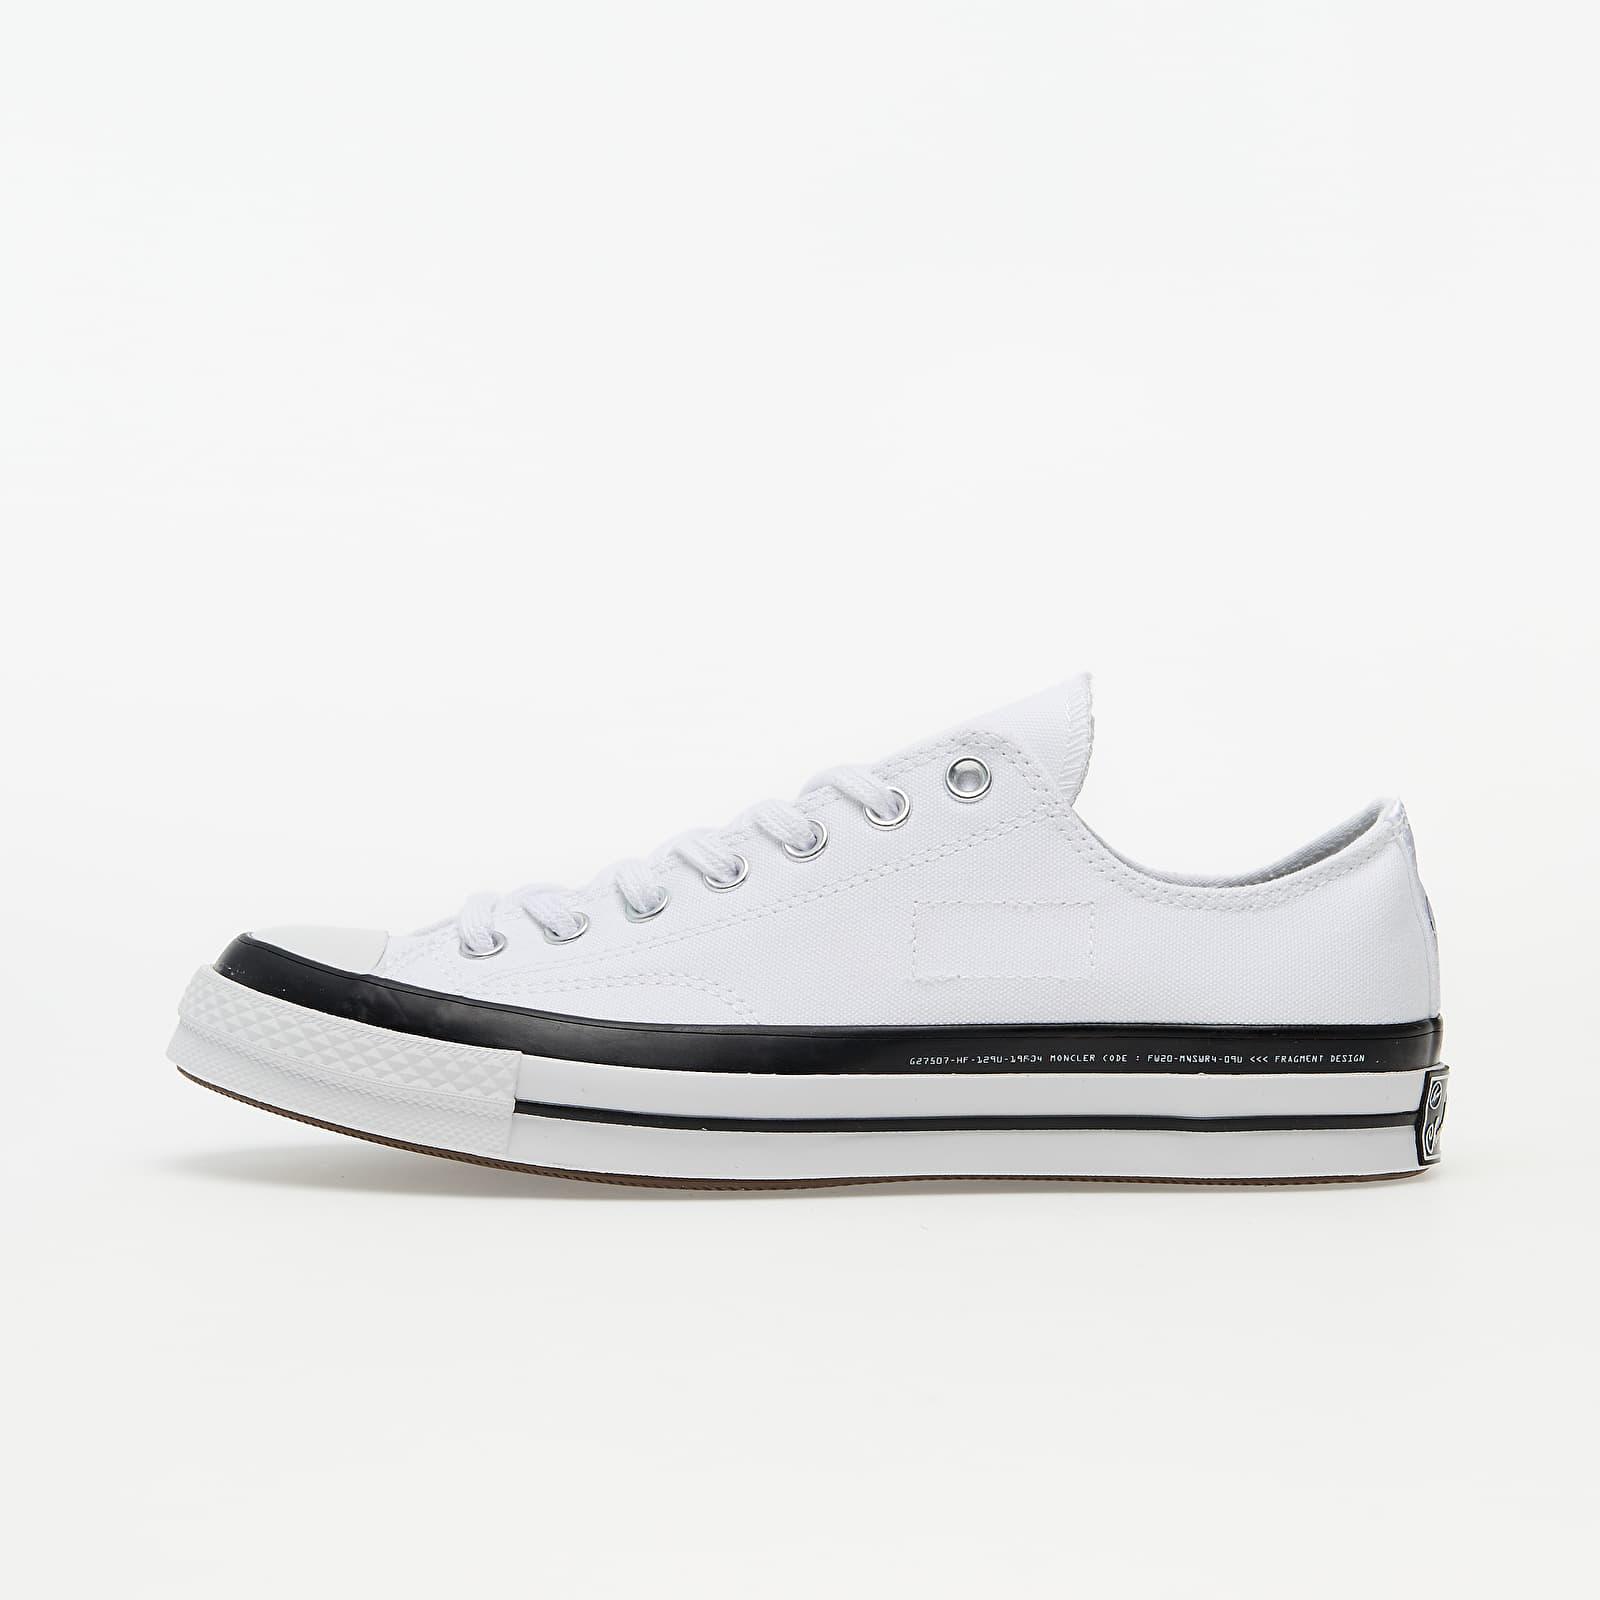 Chaussures et baskets homme Converse x Fragment Design x Moncler Chuck 70 OX White/ Black/ White